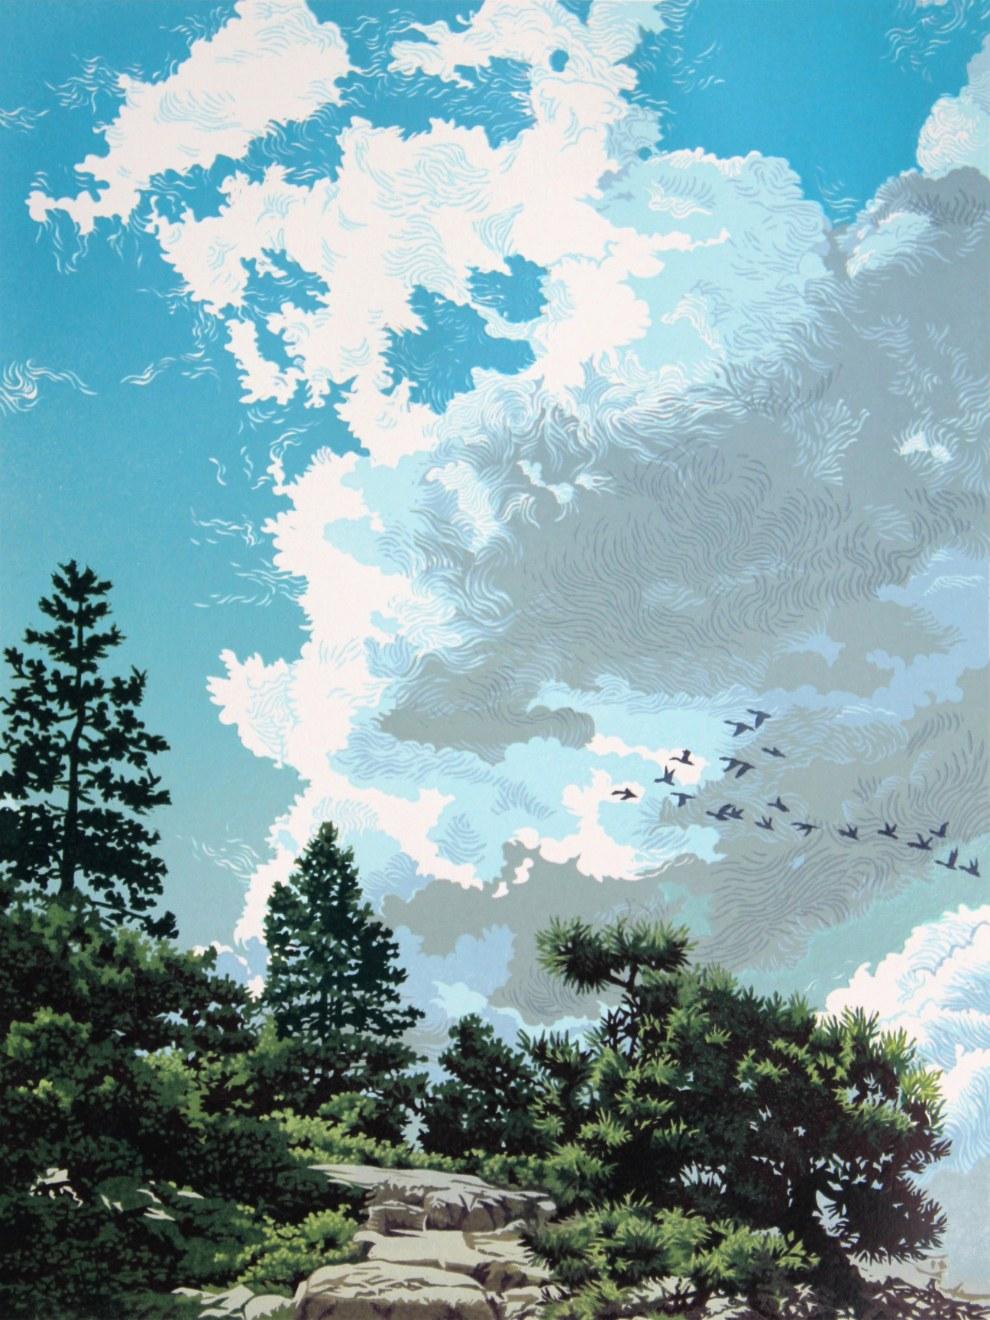 Migrant Sky, linocut print by William H. Hays